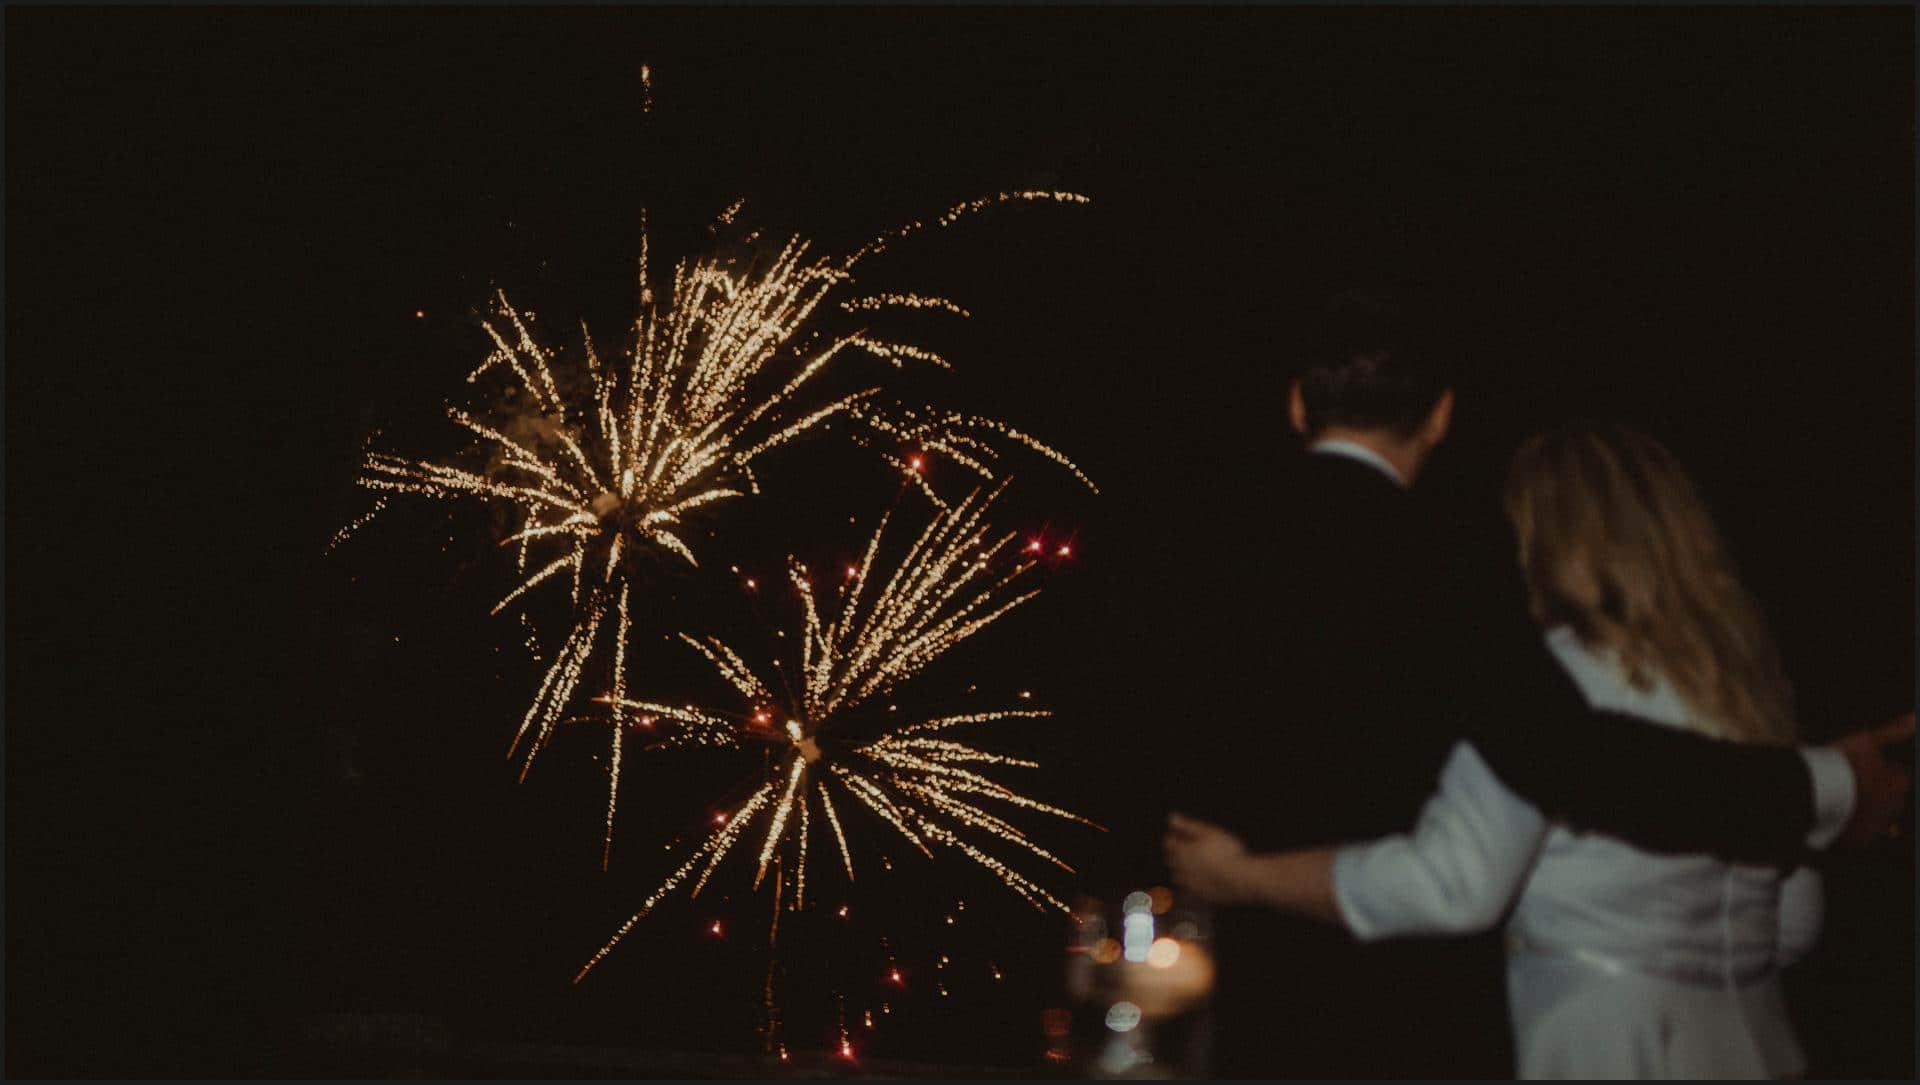 borgo di tragliata, wedding, rome, wedding in rome, bride and groom, fireworks, wedding in rome